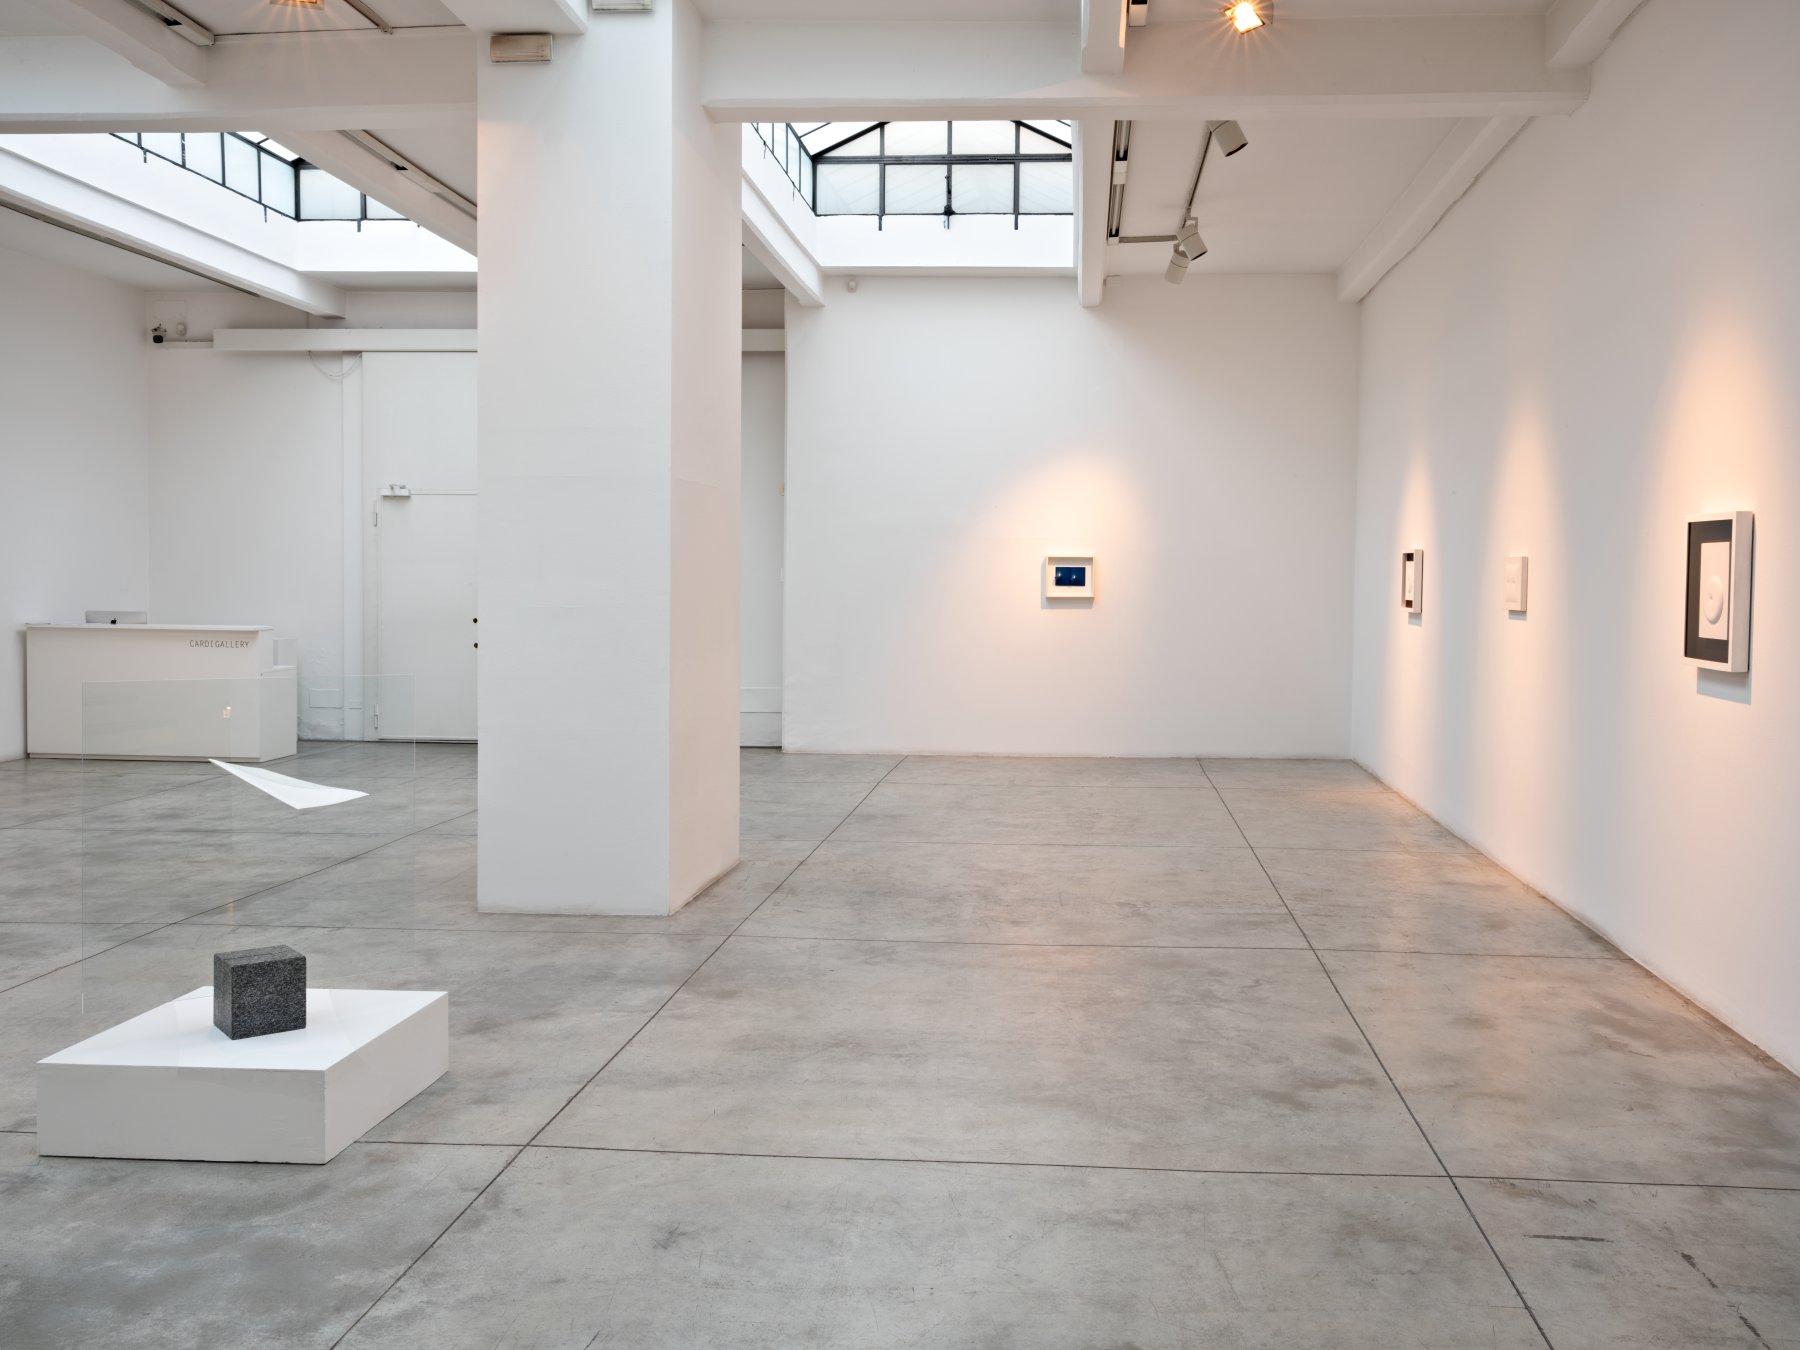 Cardi Gallery Milan Agostino Bonalumi 1